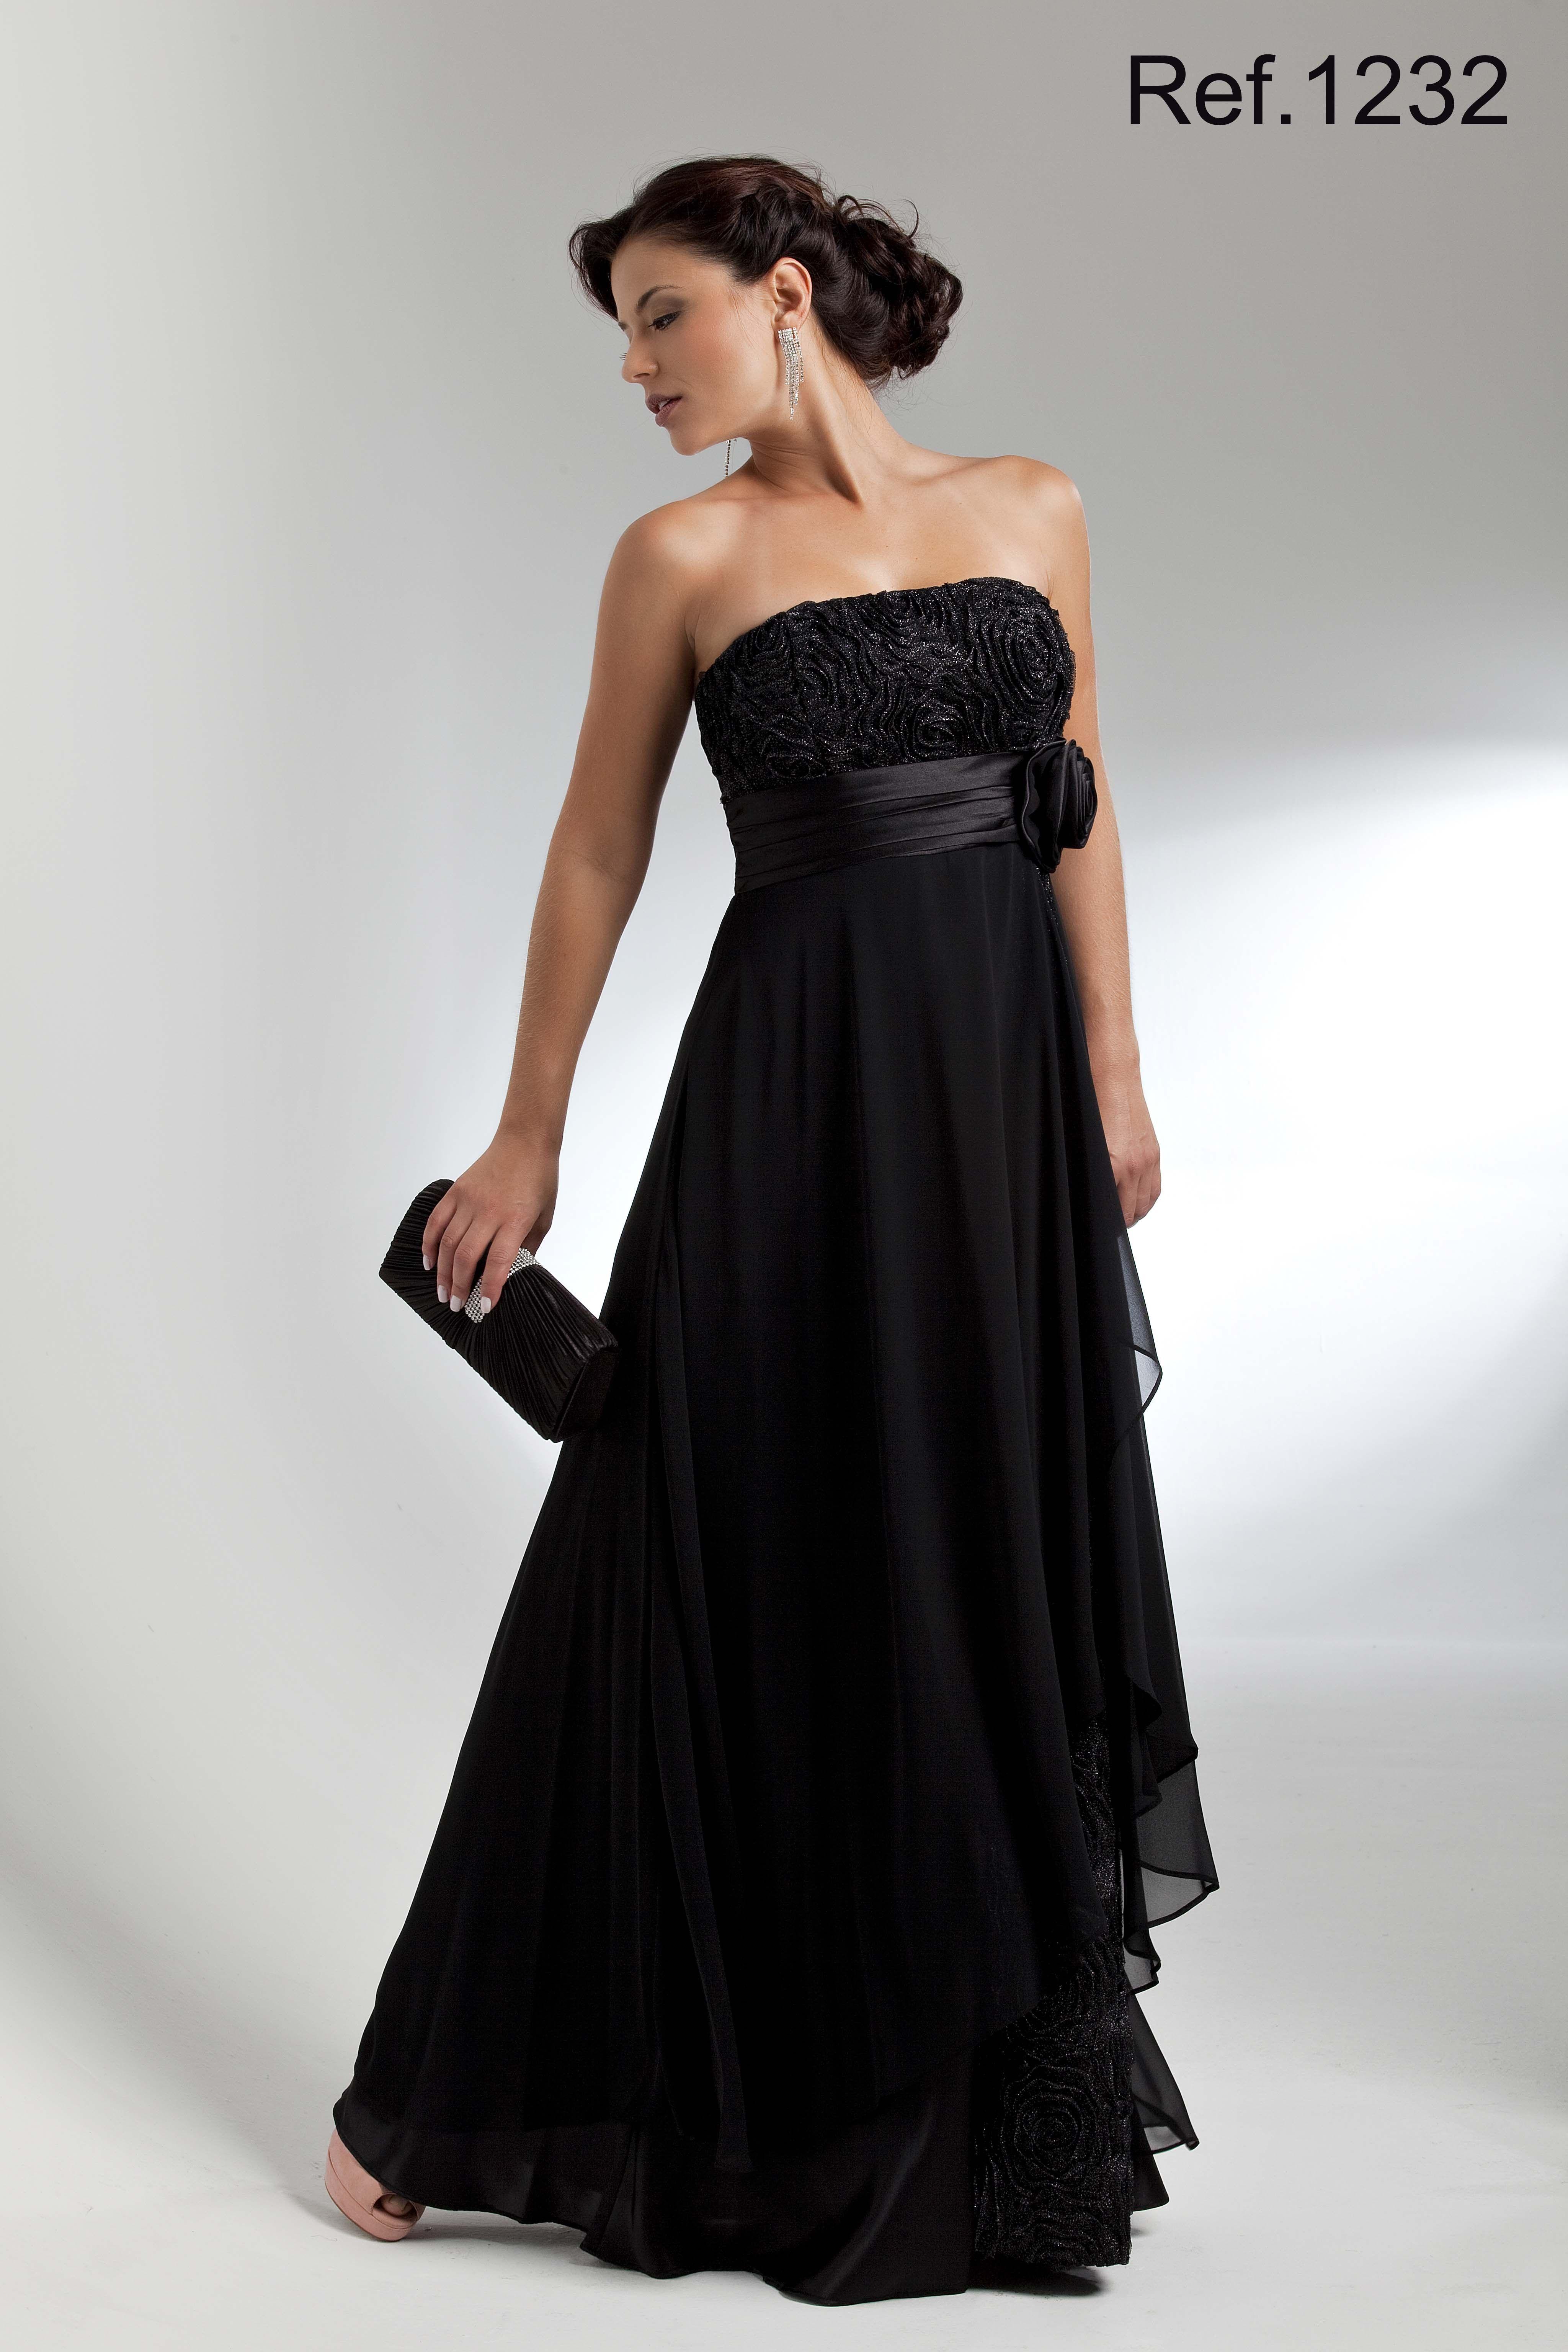 2a75dcbb10 Vestido de Festa Longo preto tomara que caia com rosas de tule no busto e  na fenda lateral - 1232